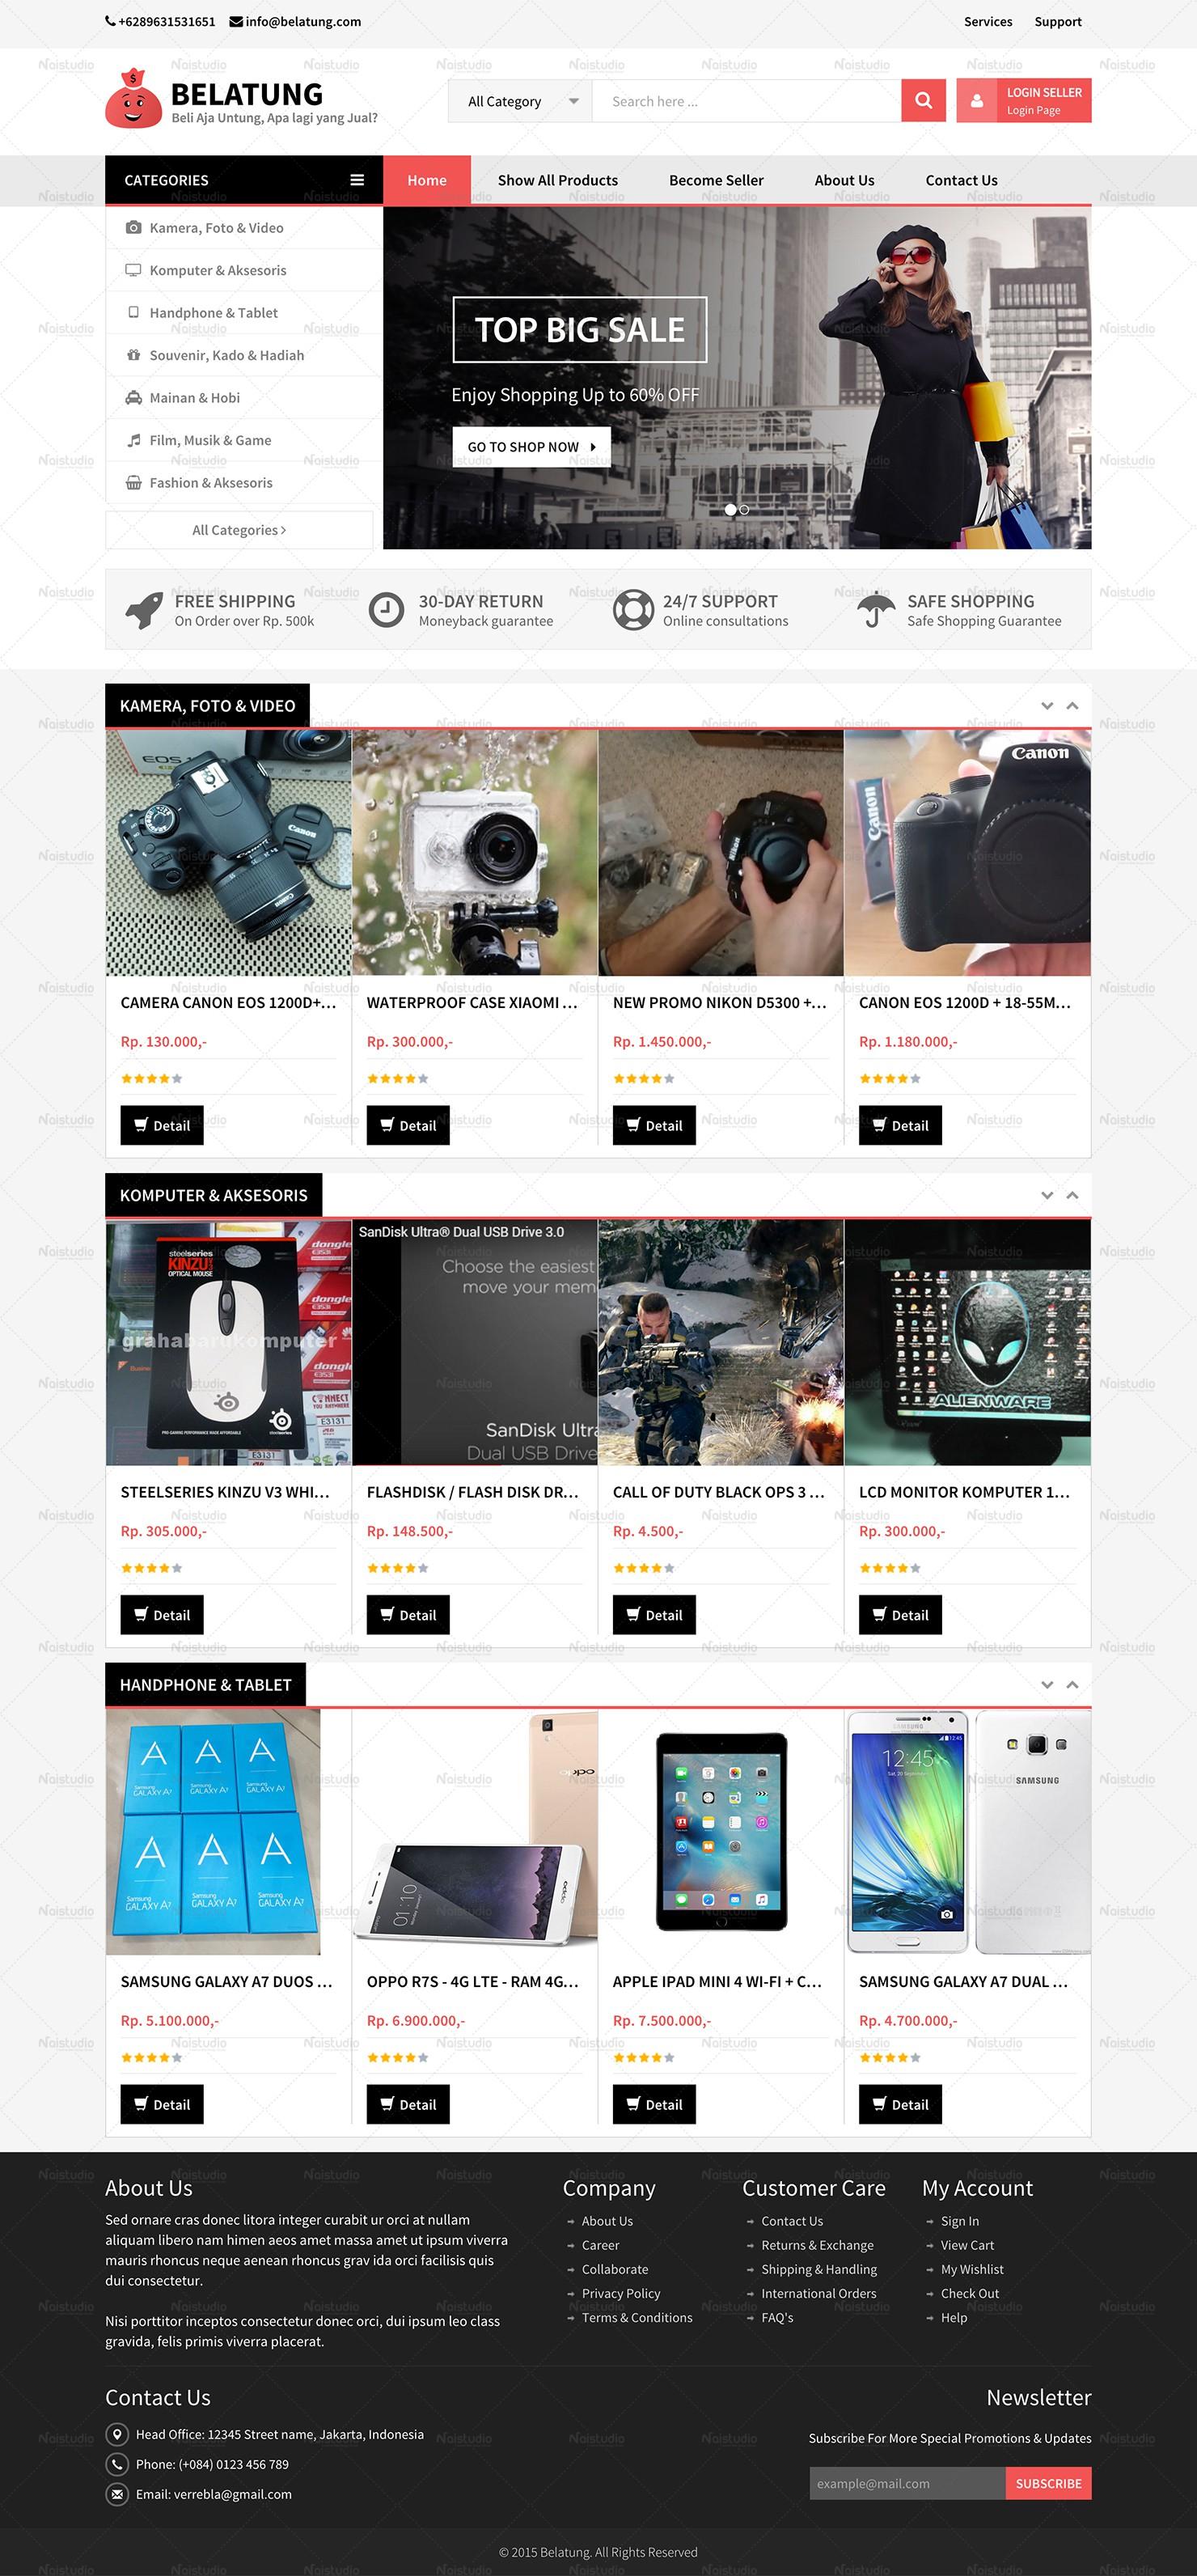 BELATUNG - Online Shop